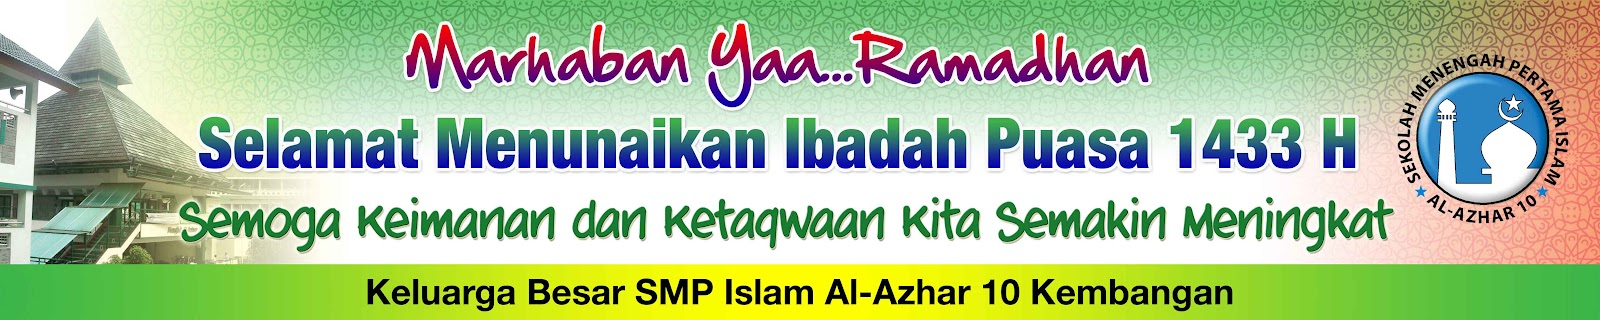 Contoh Banner Menyambut Ramadhan Downlllll